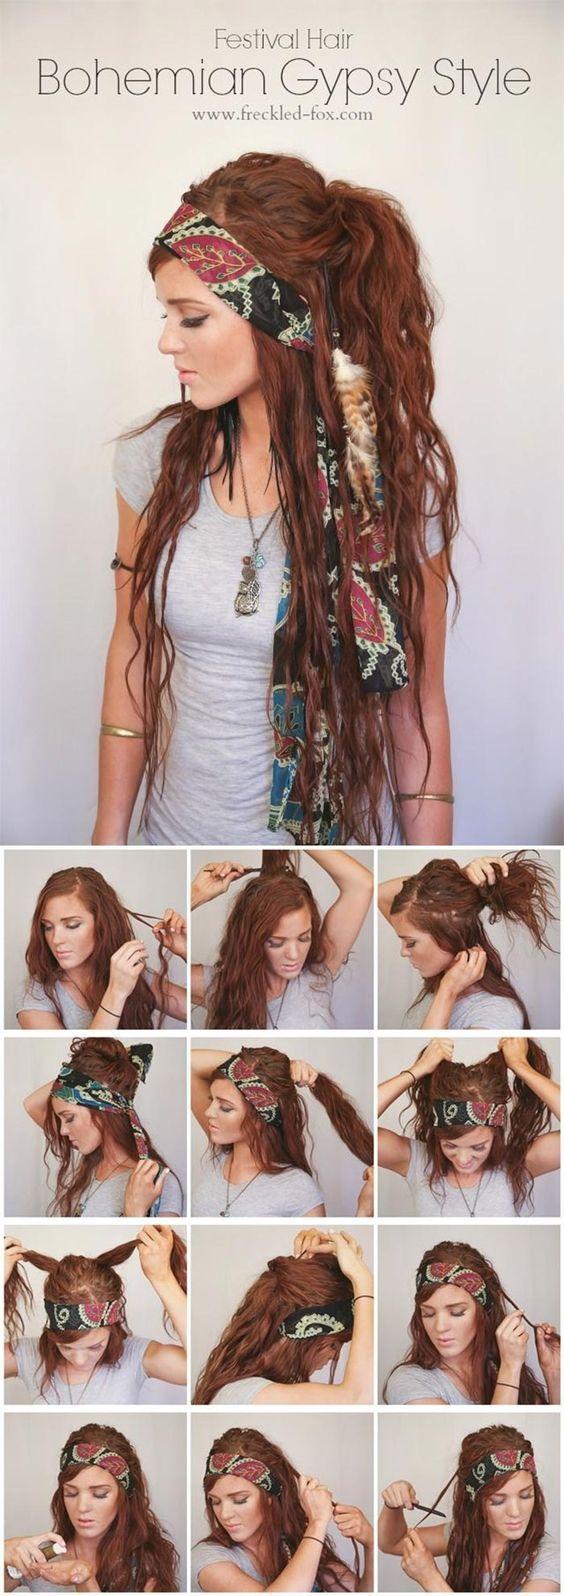 Gypsy hairstyle tutorial idea - Miladies.net